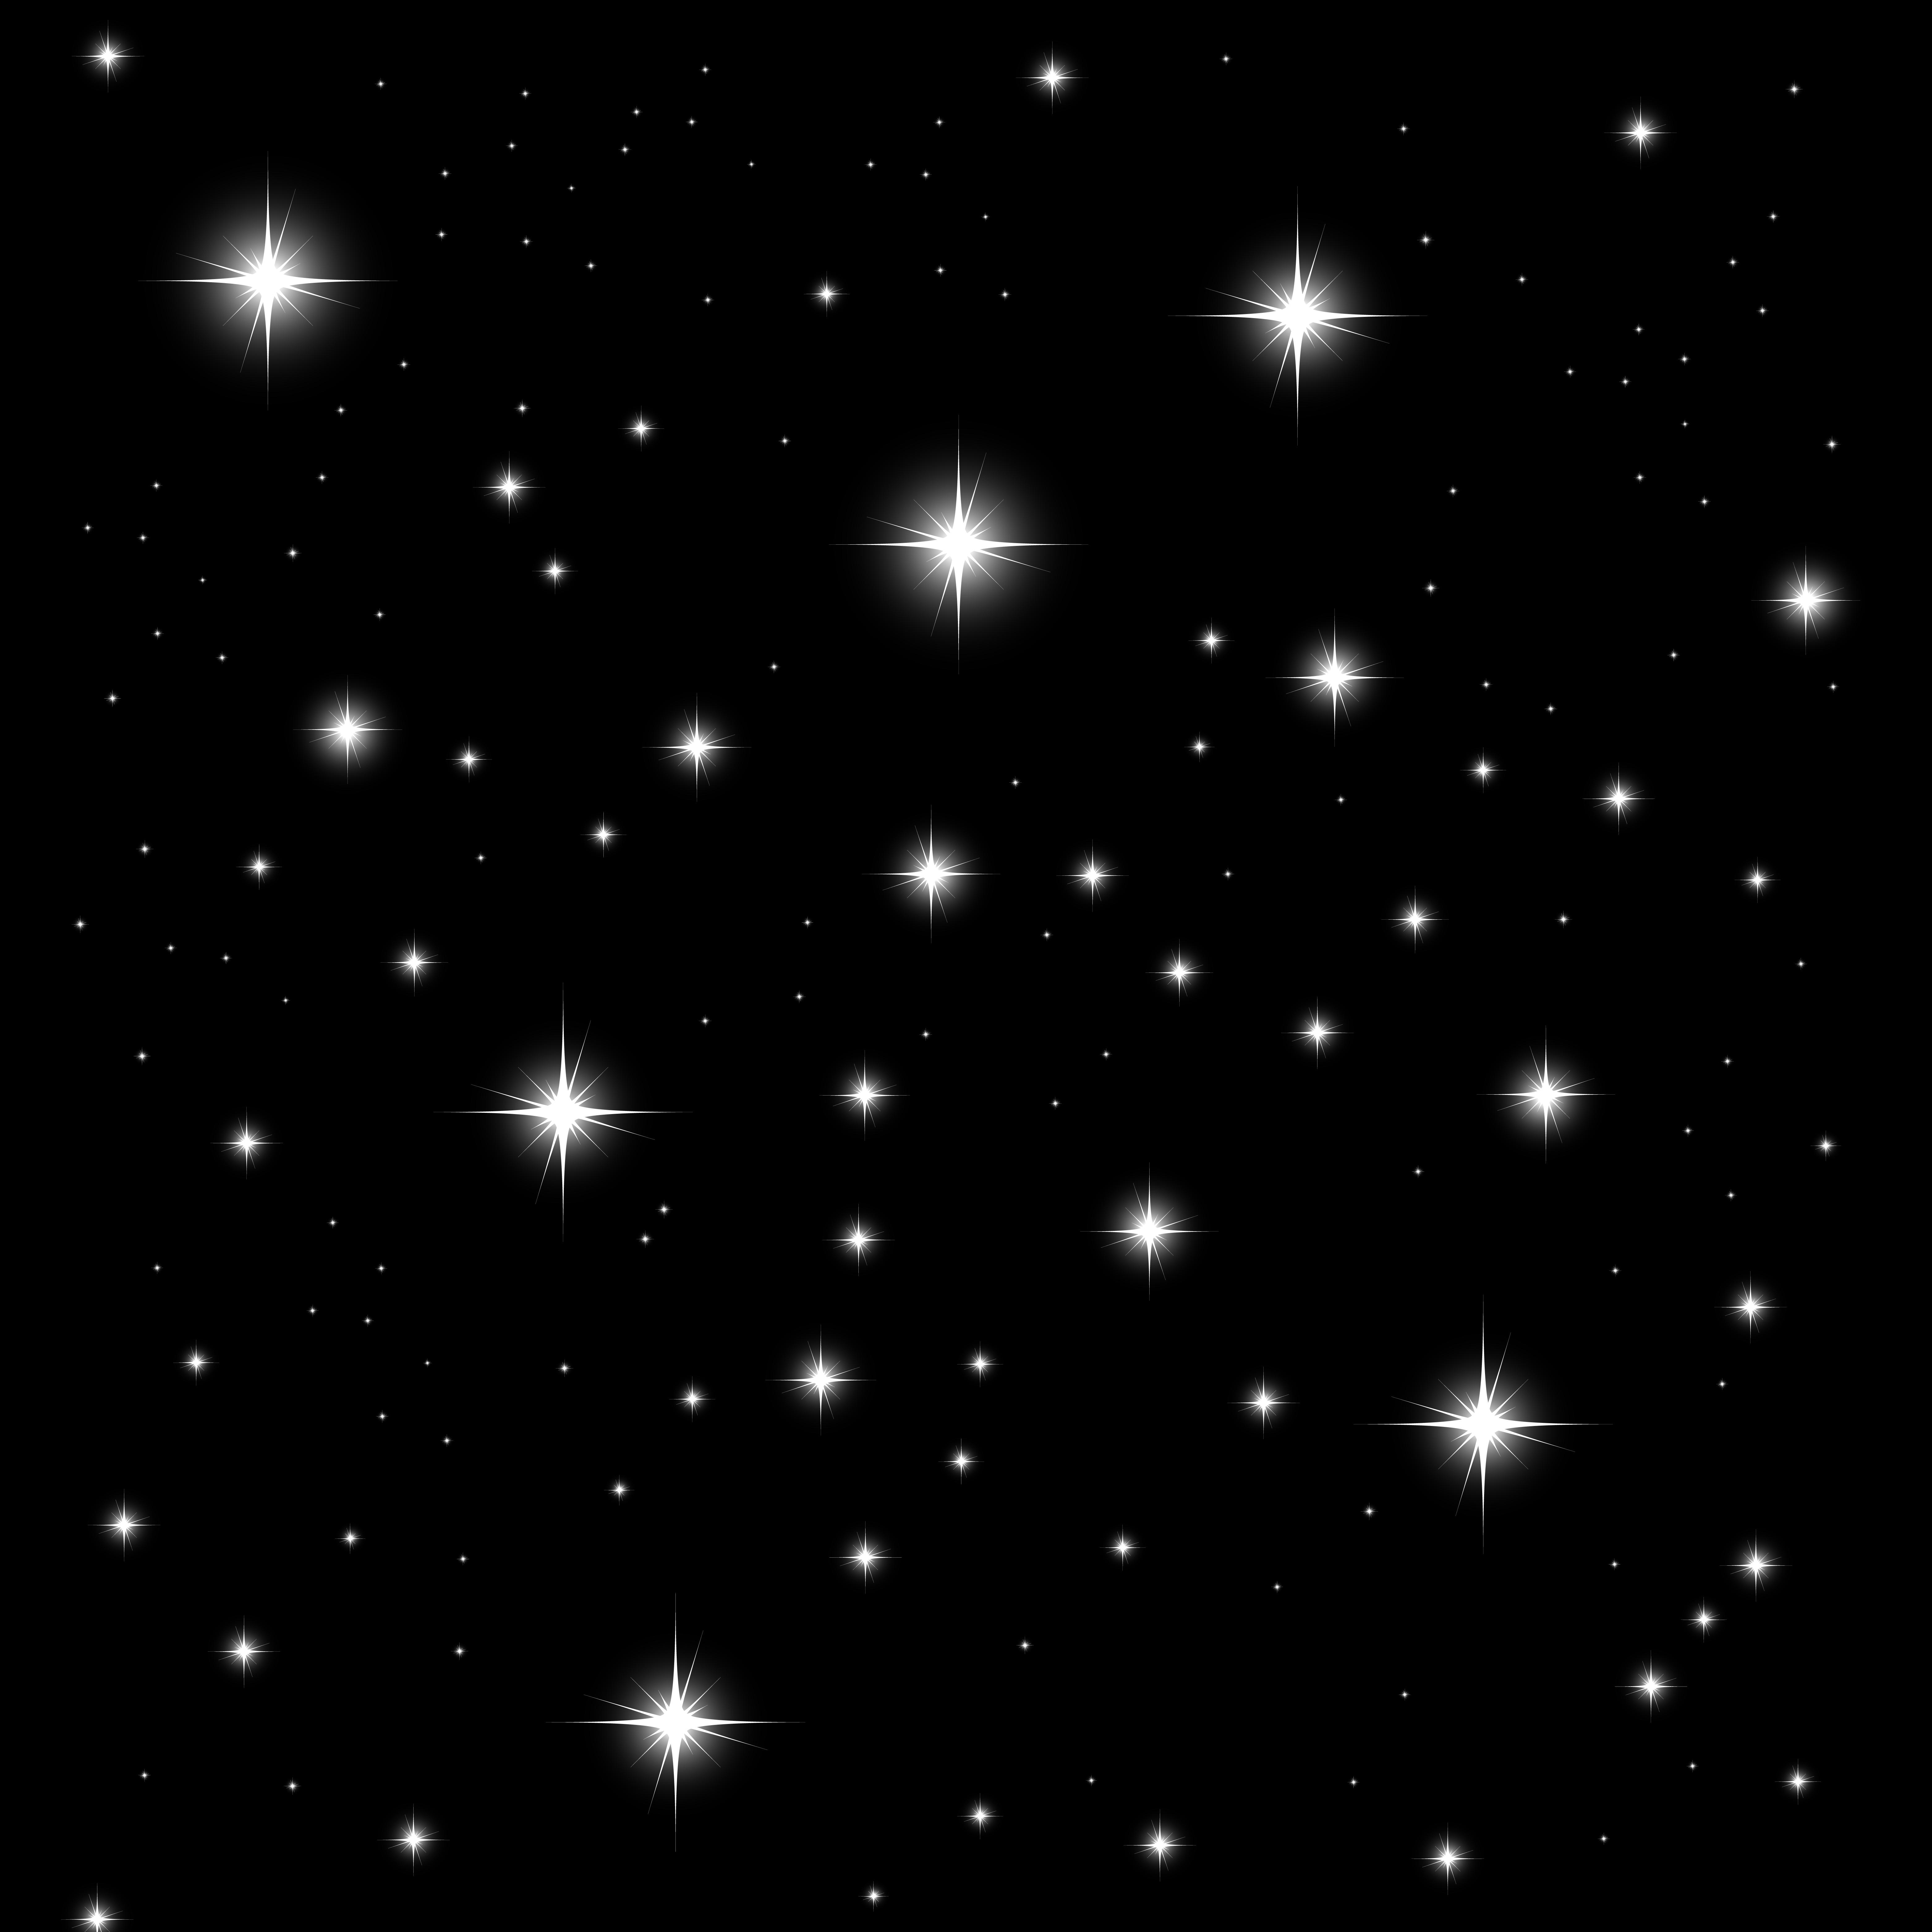 Starlight On Black Background